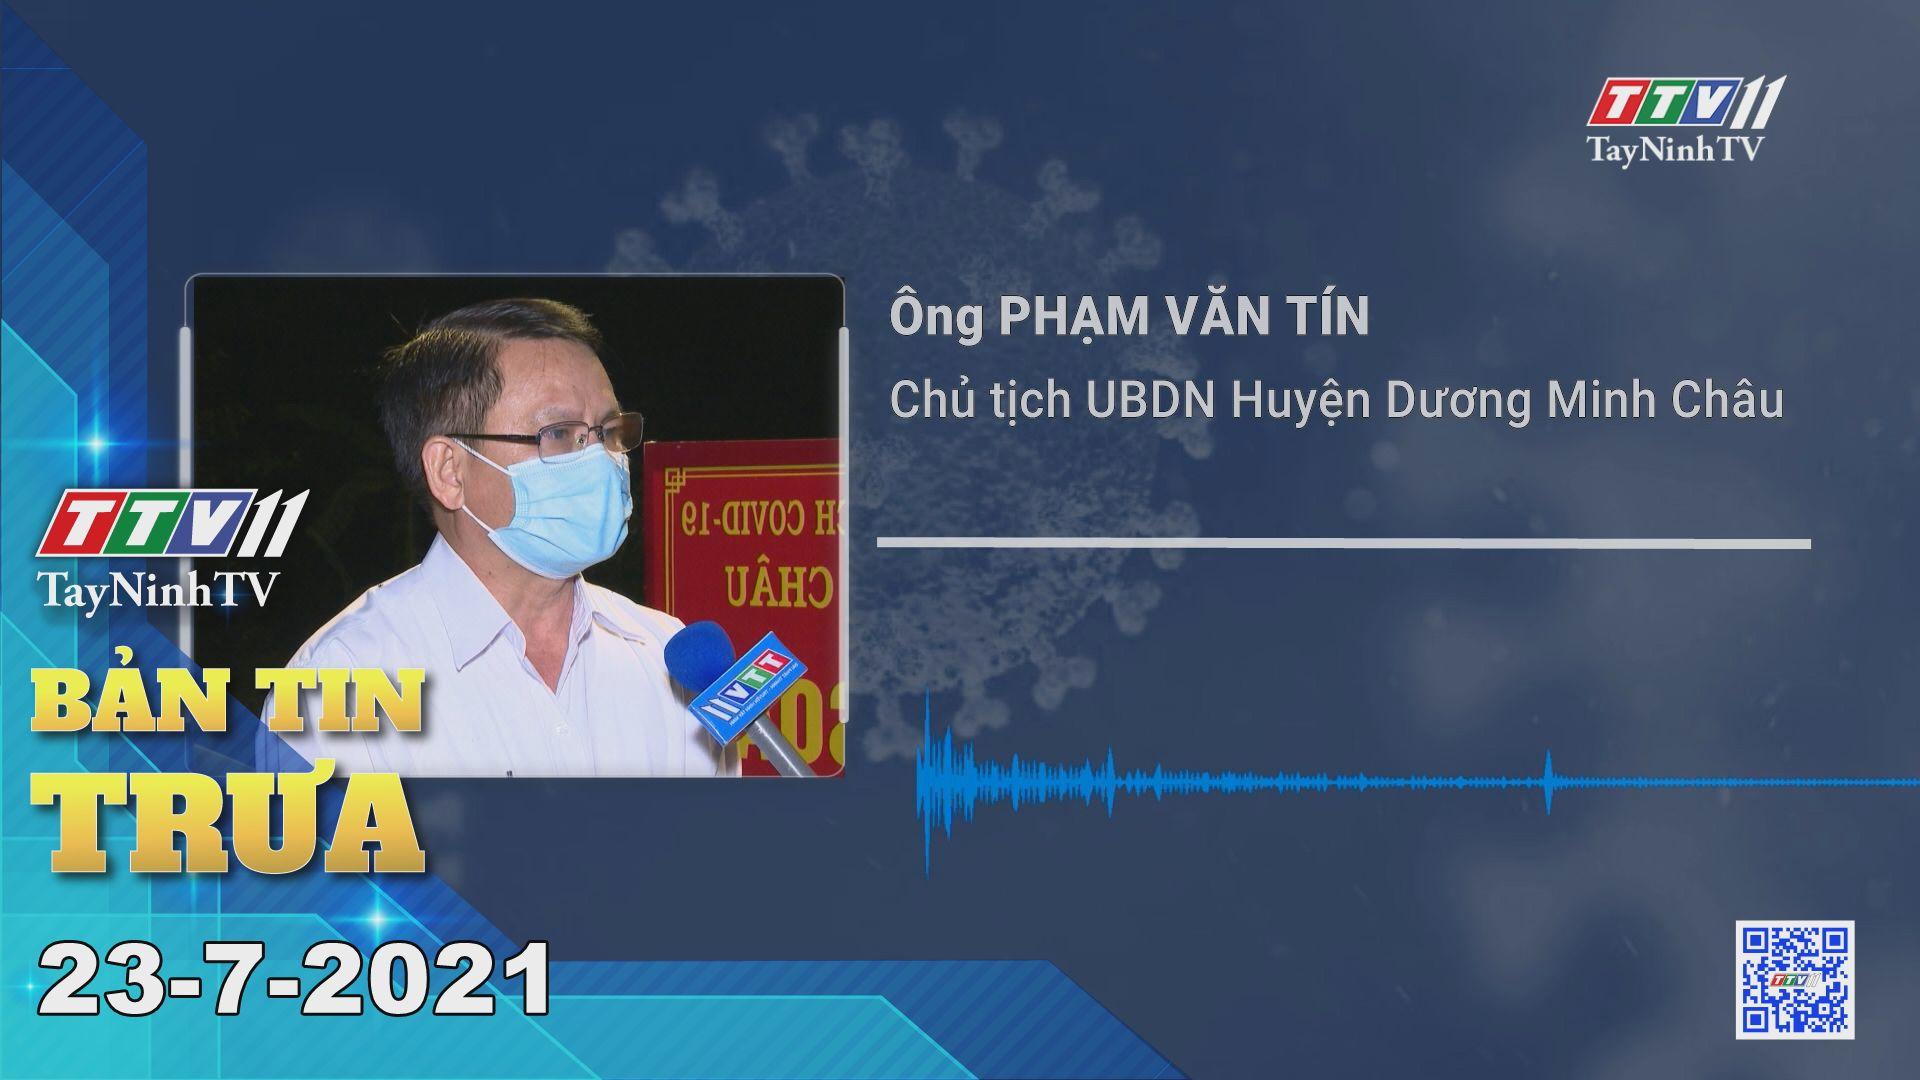 Bản tin trưa 23-7-2021 | Tin tức hôm nay | TayNinhTV